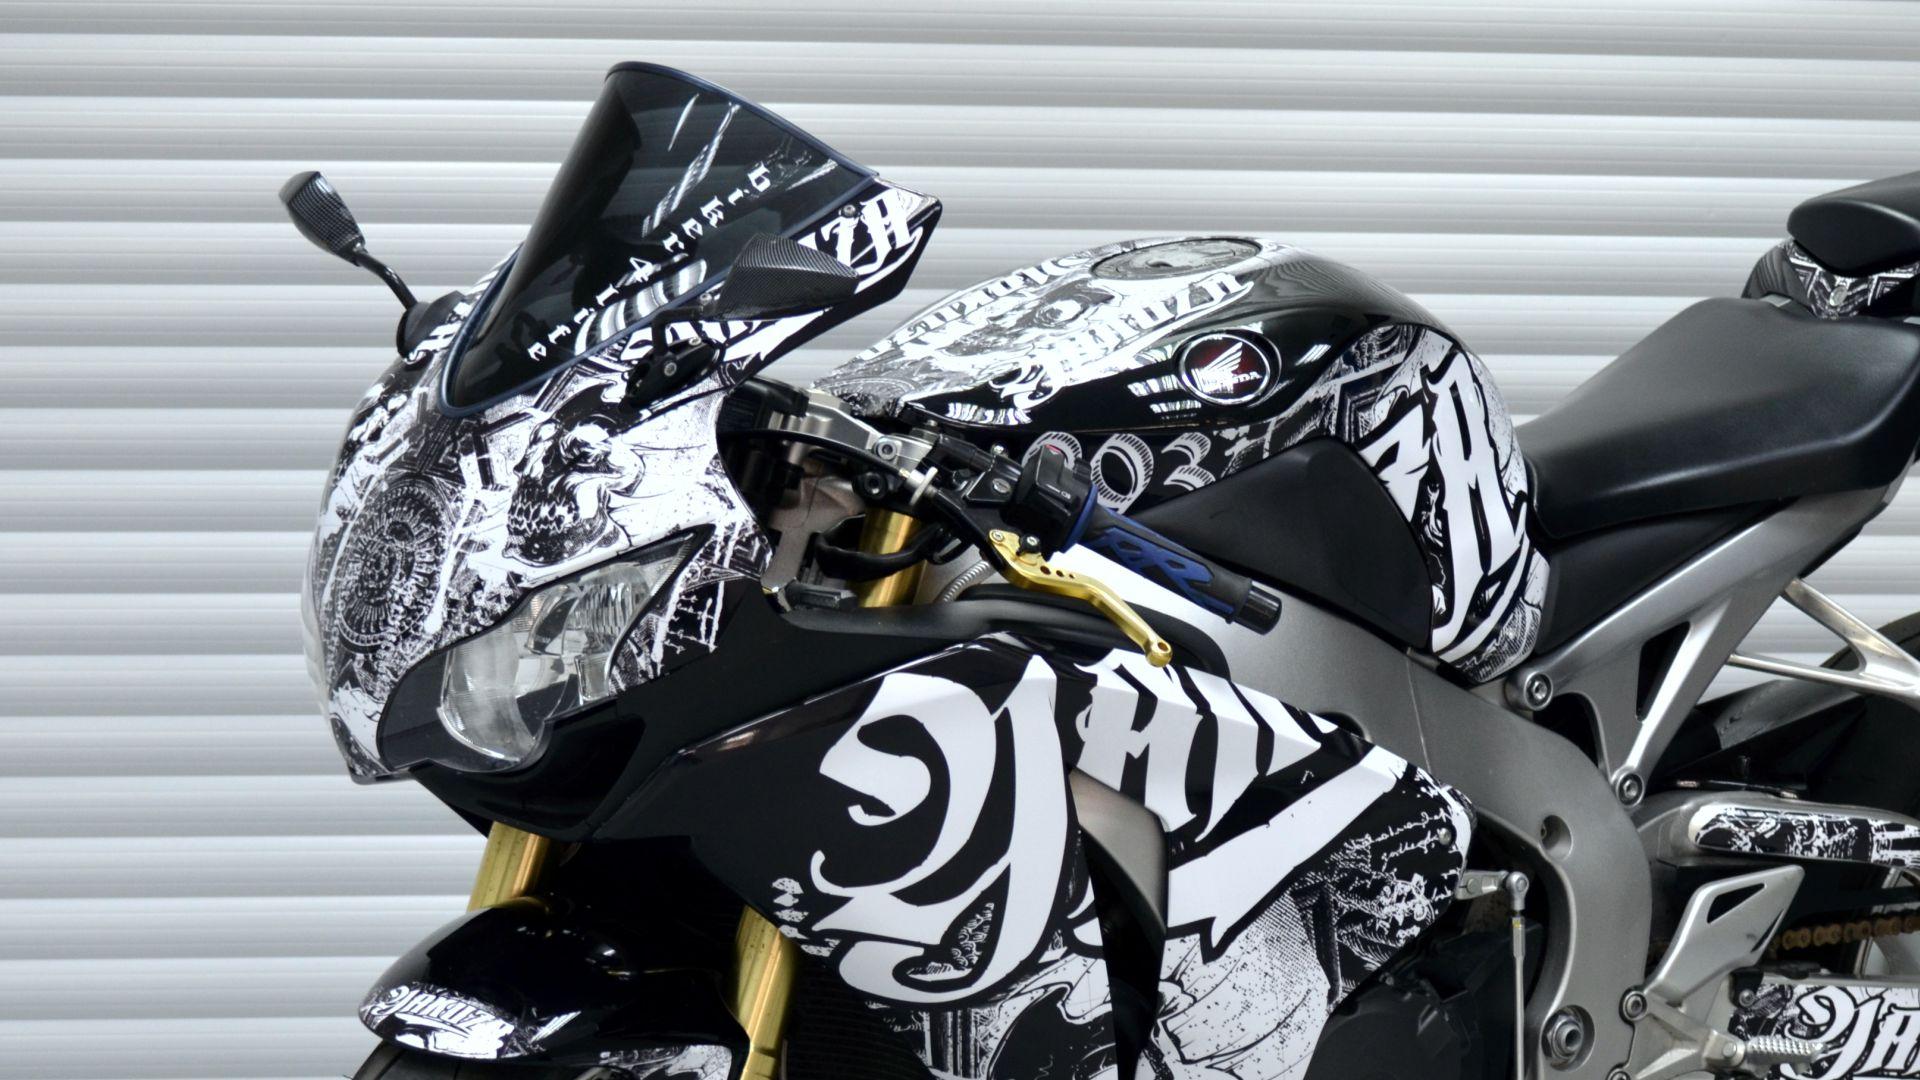 Honda Cbr 1000 Rr Black Yakuza Dsg Folierung 4moto Individuelle Motorradaufkleber Bikedekore Wheelskinzz